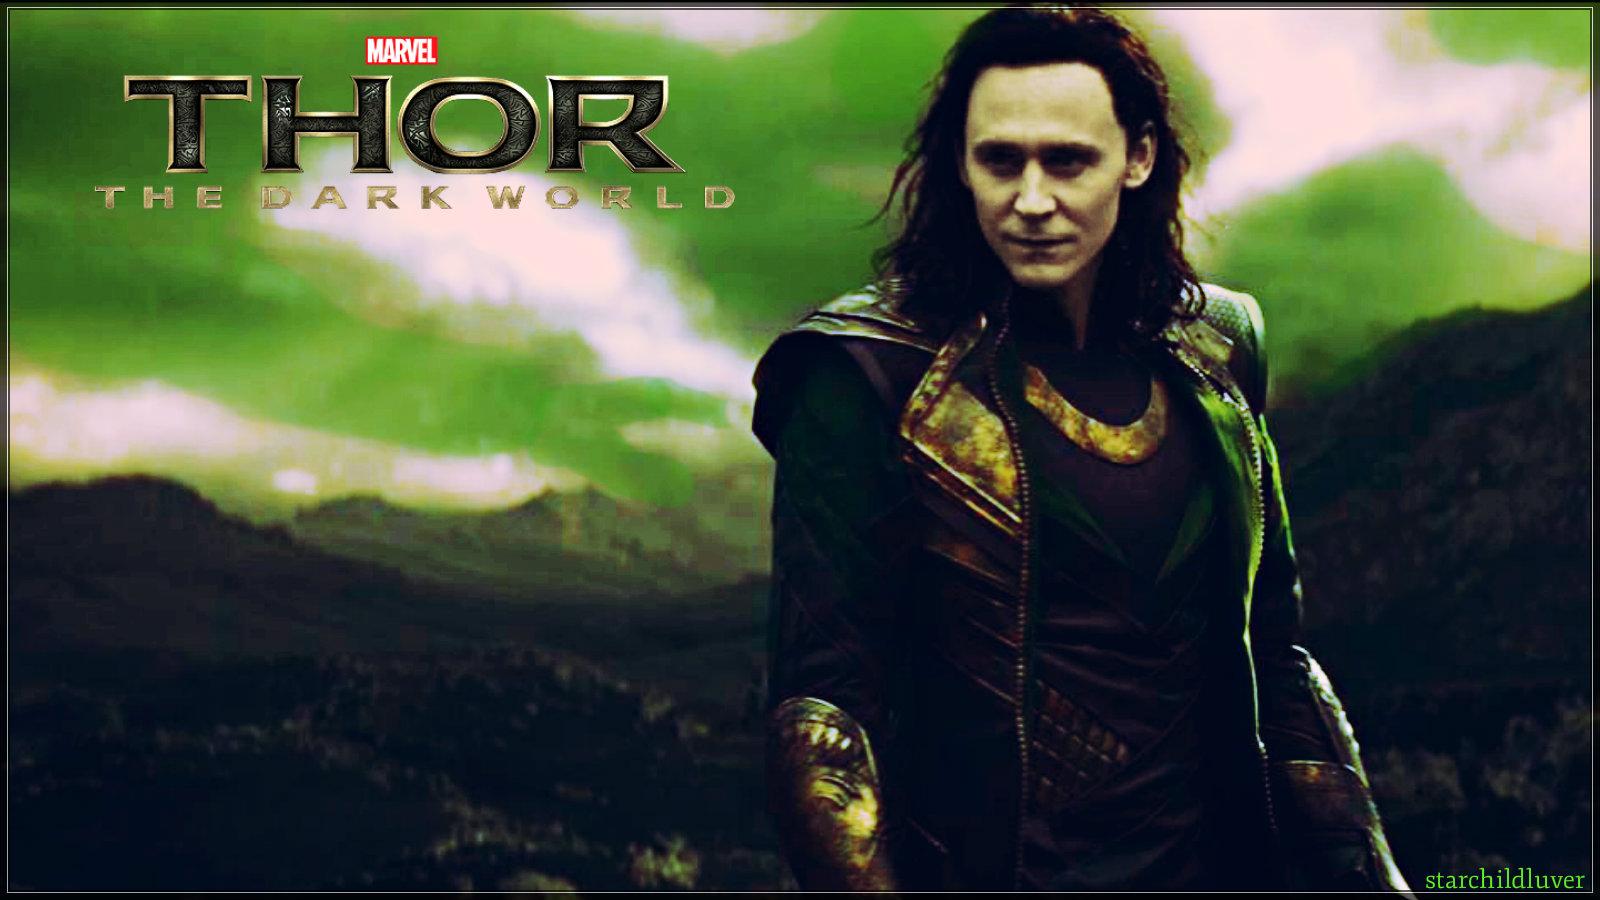 Most Inspiring Wallpaper Marvel Loki - Team-Loki-image-team-loki-36734176-1600-900  Trends_1001865.jpg